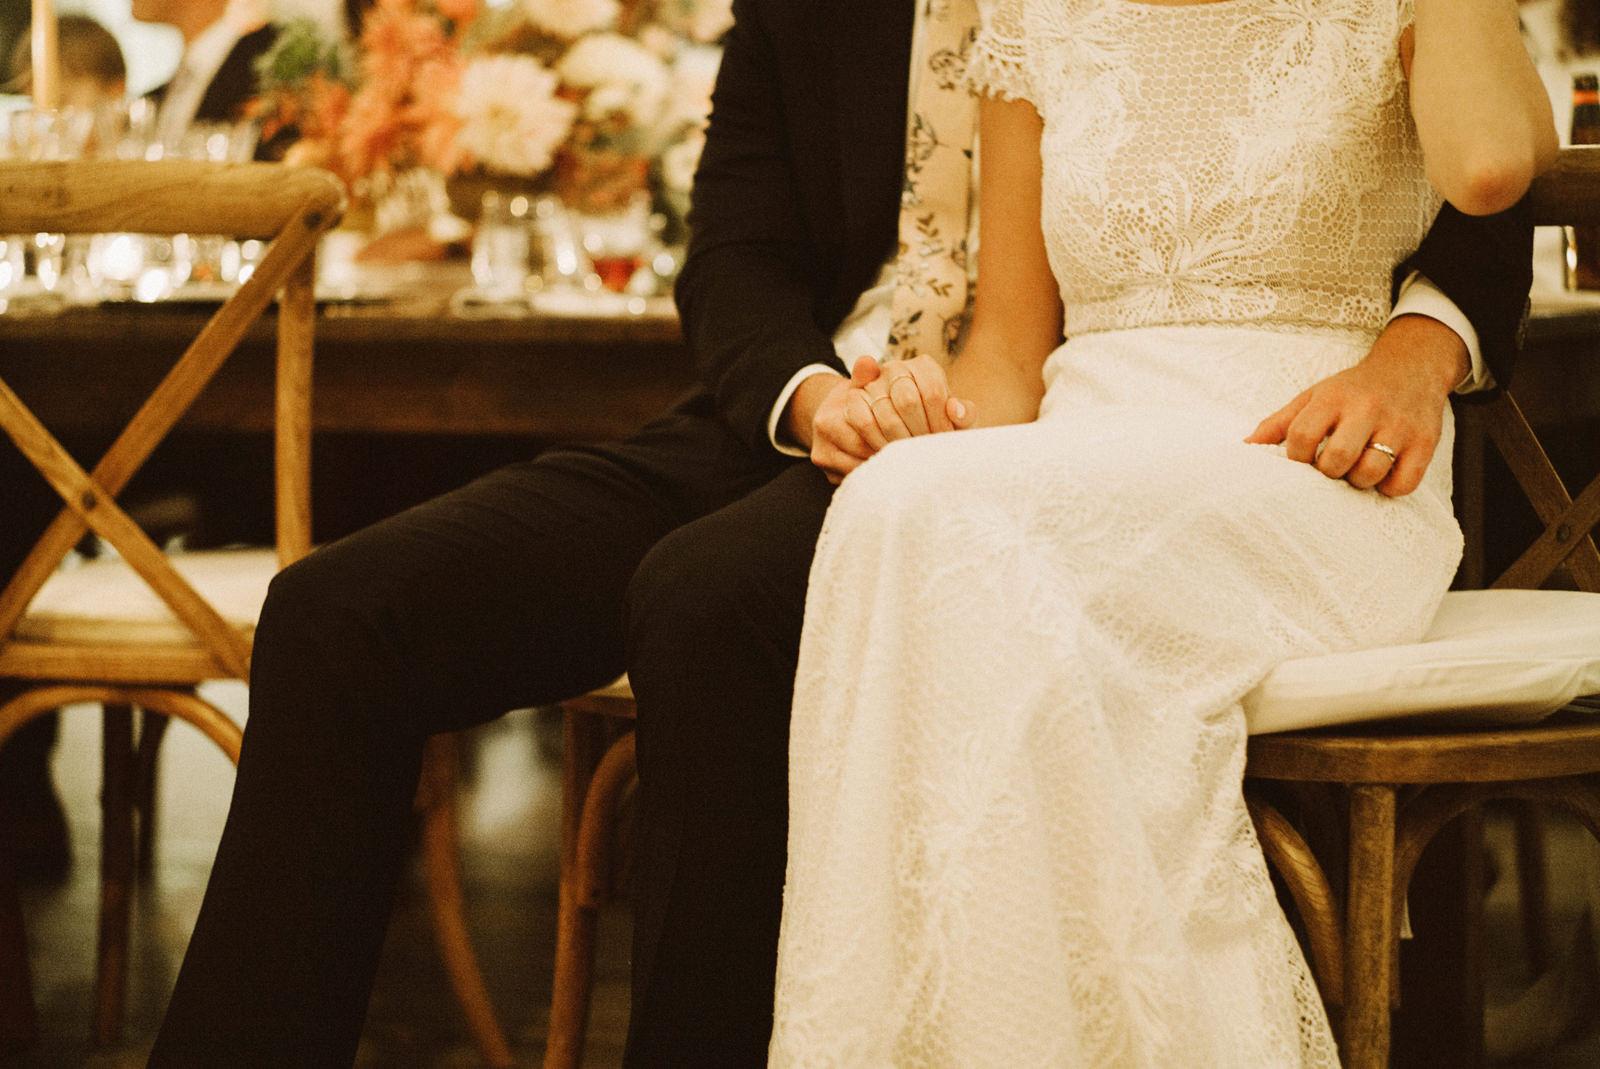 bridgeport-wedding-155 BRIDGEPORT, CONNECTICUT BACKYARD WEDDING